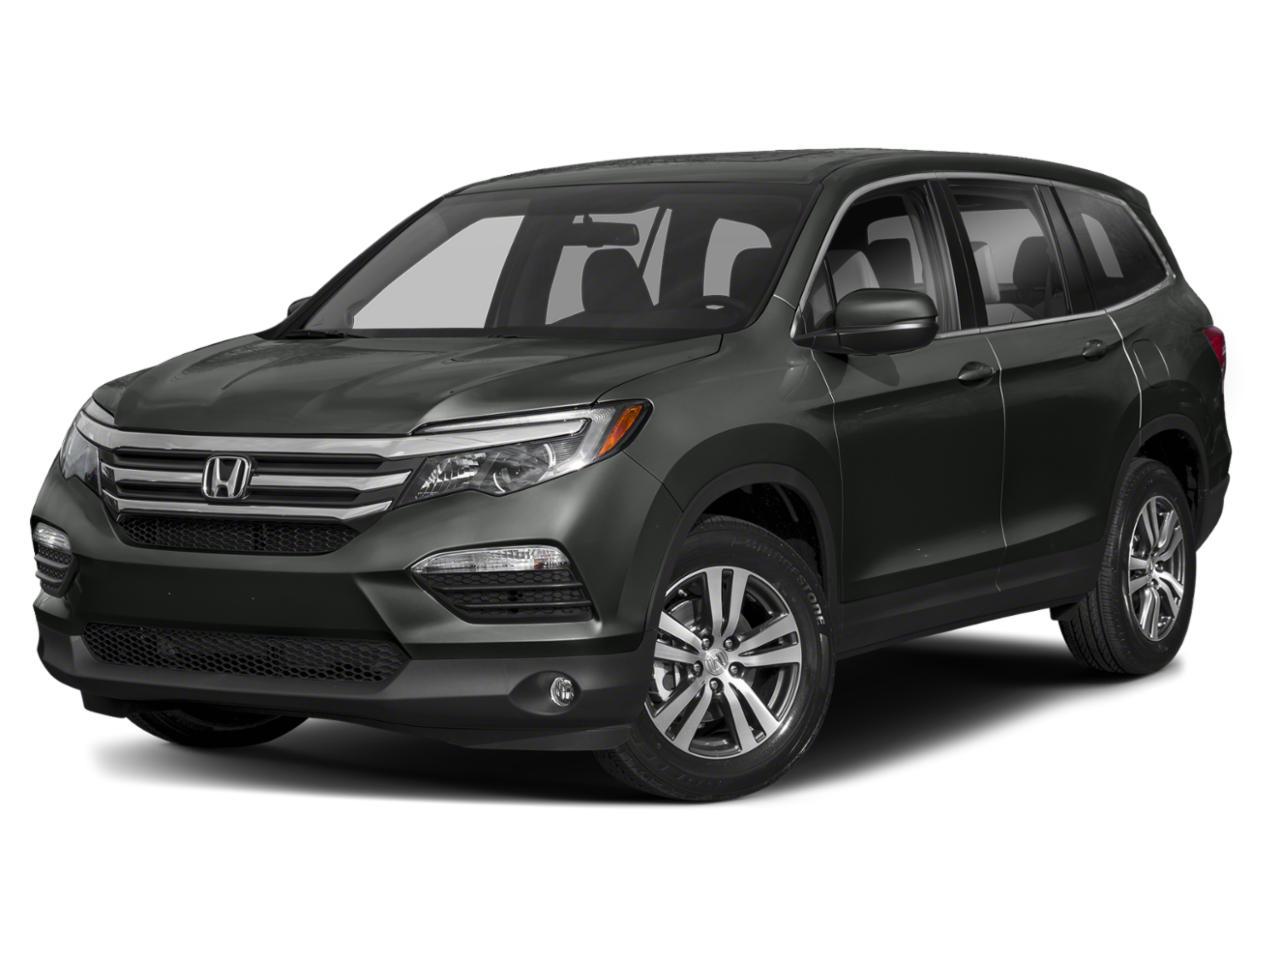 2018 Honda Pilot Vehicle Photo in San Antonio, TX 78238